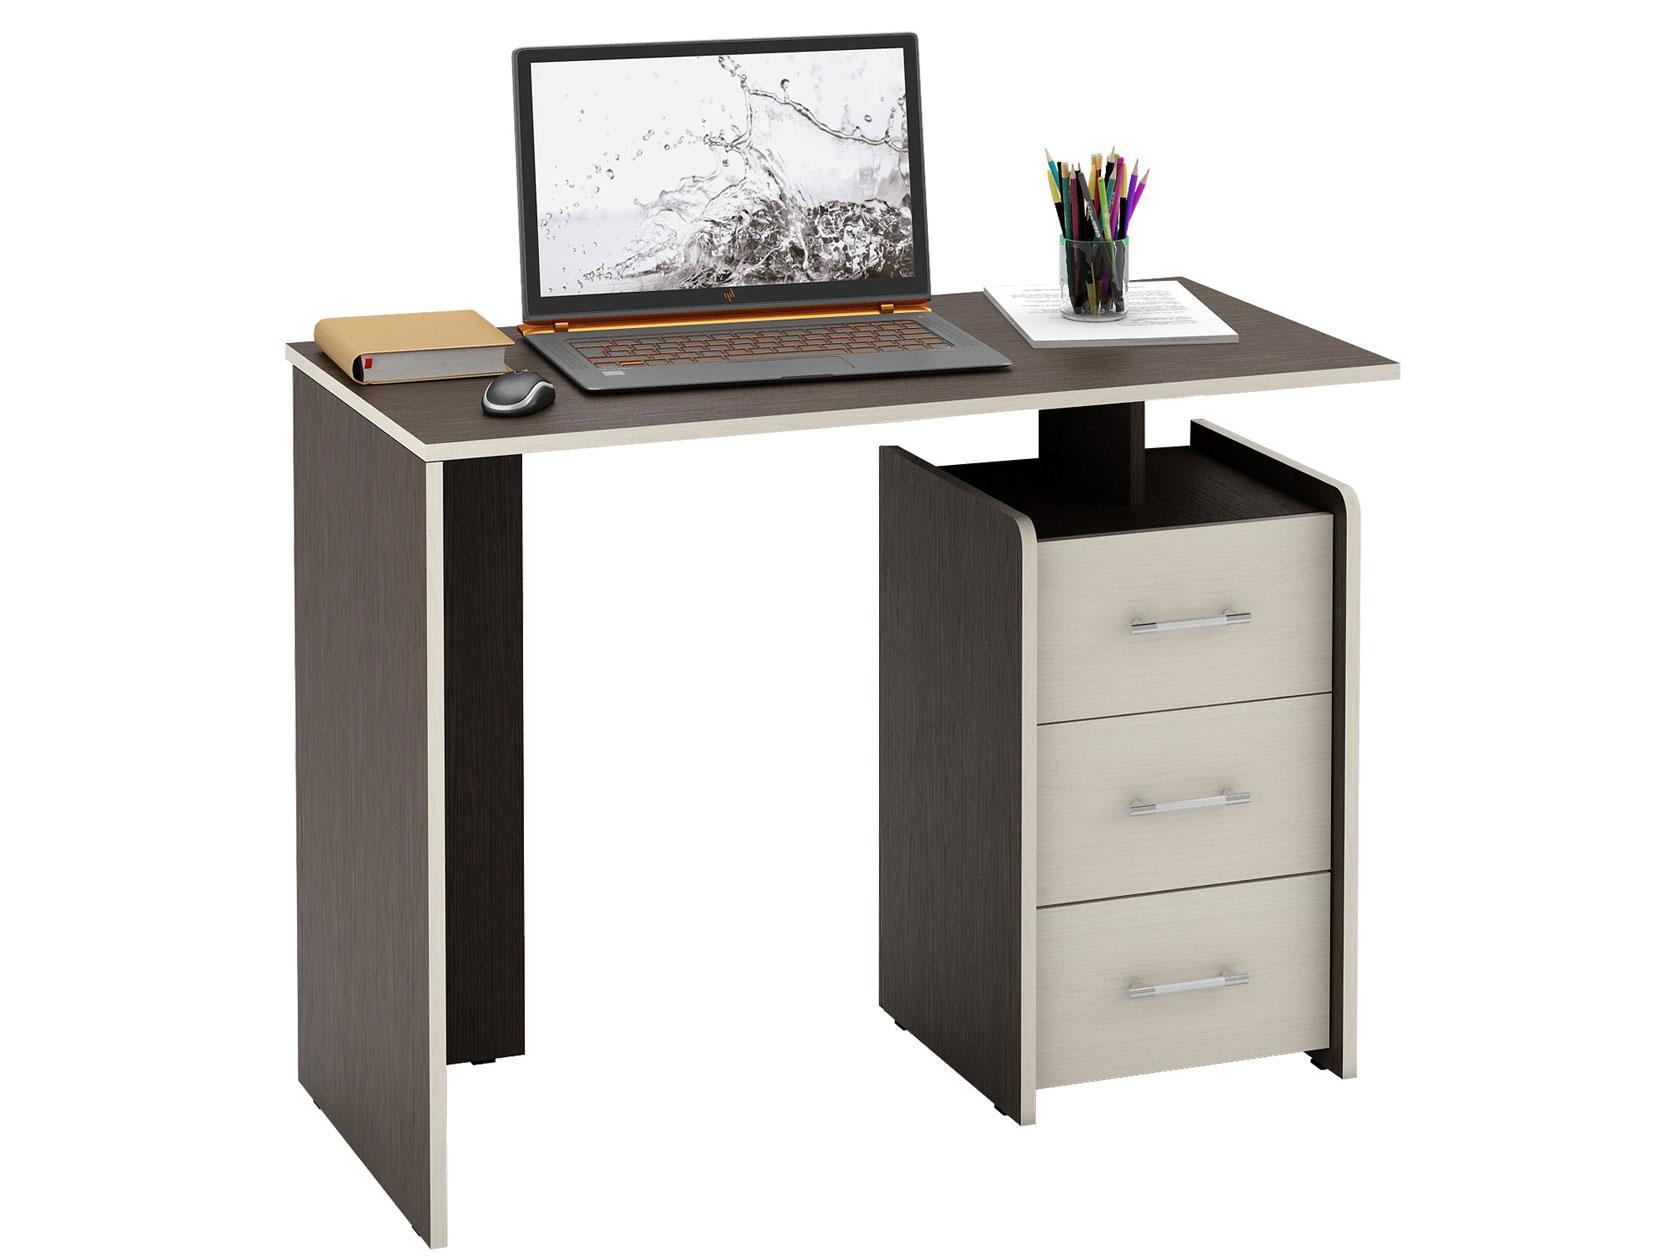 Компьютерный стол МФ Мастер Слим-1 103x50x75, венге/дуб молочный